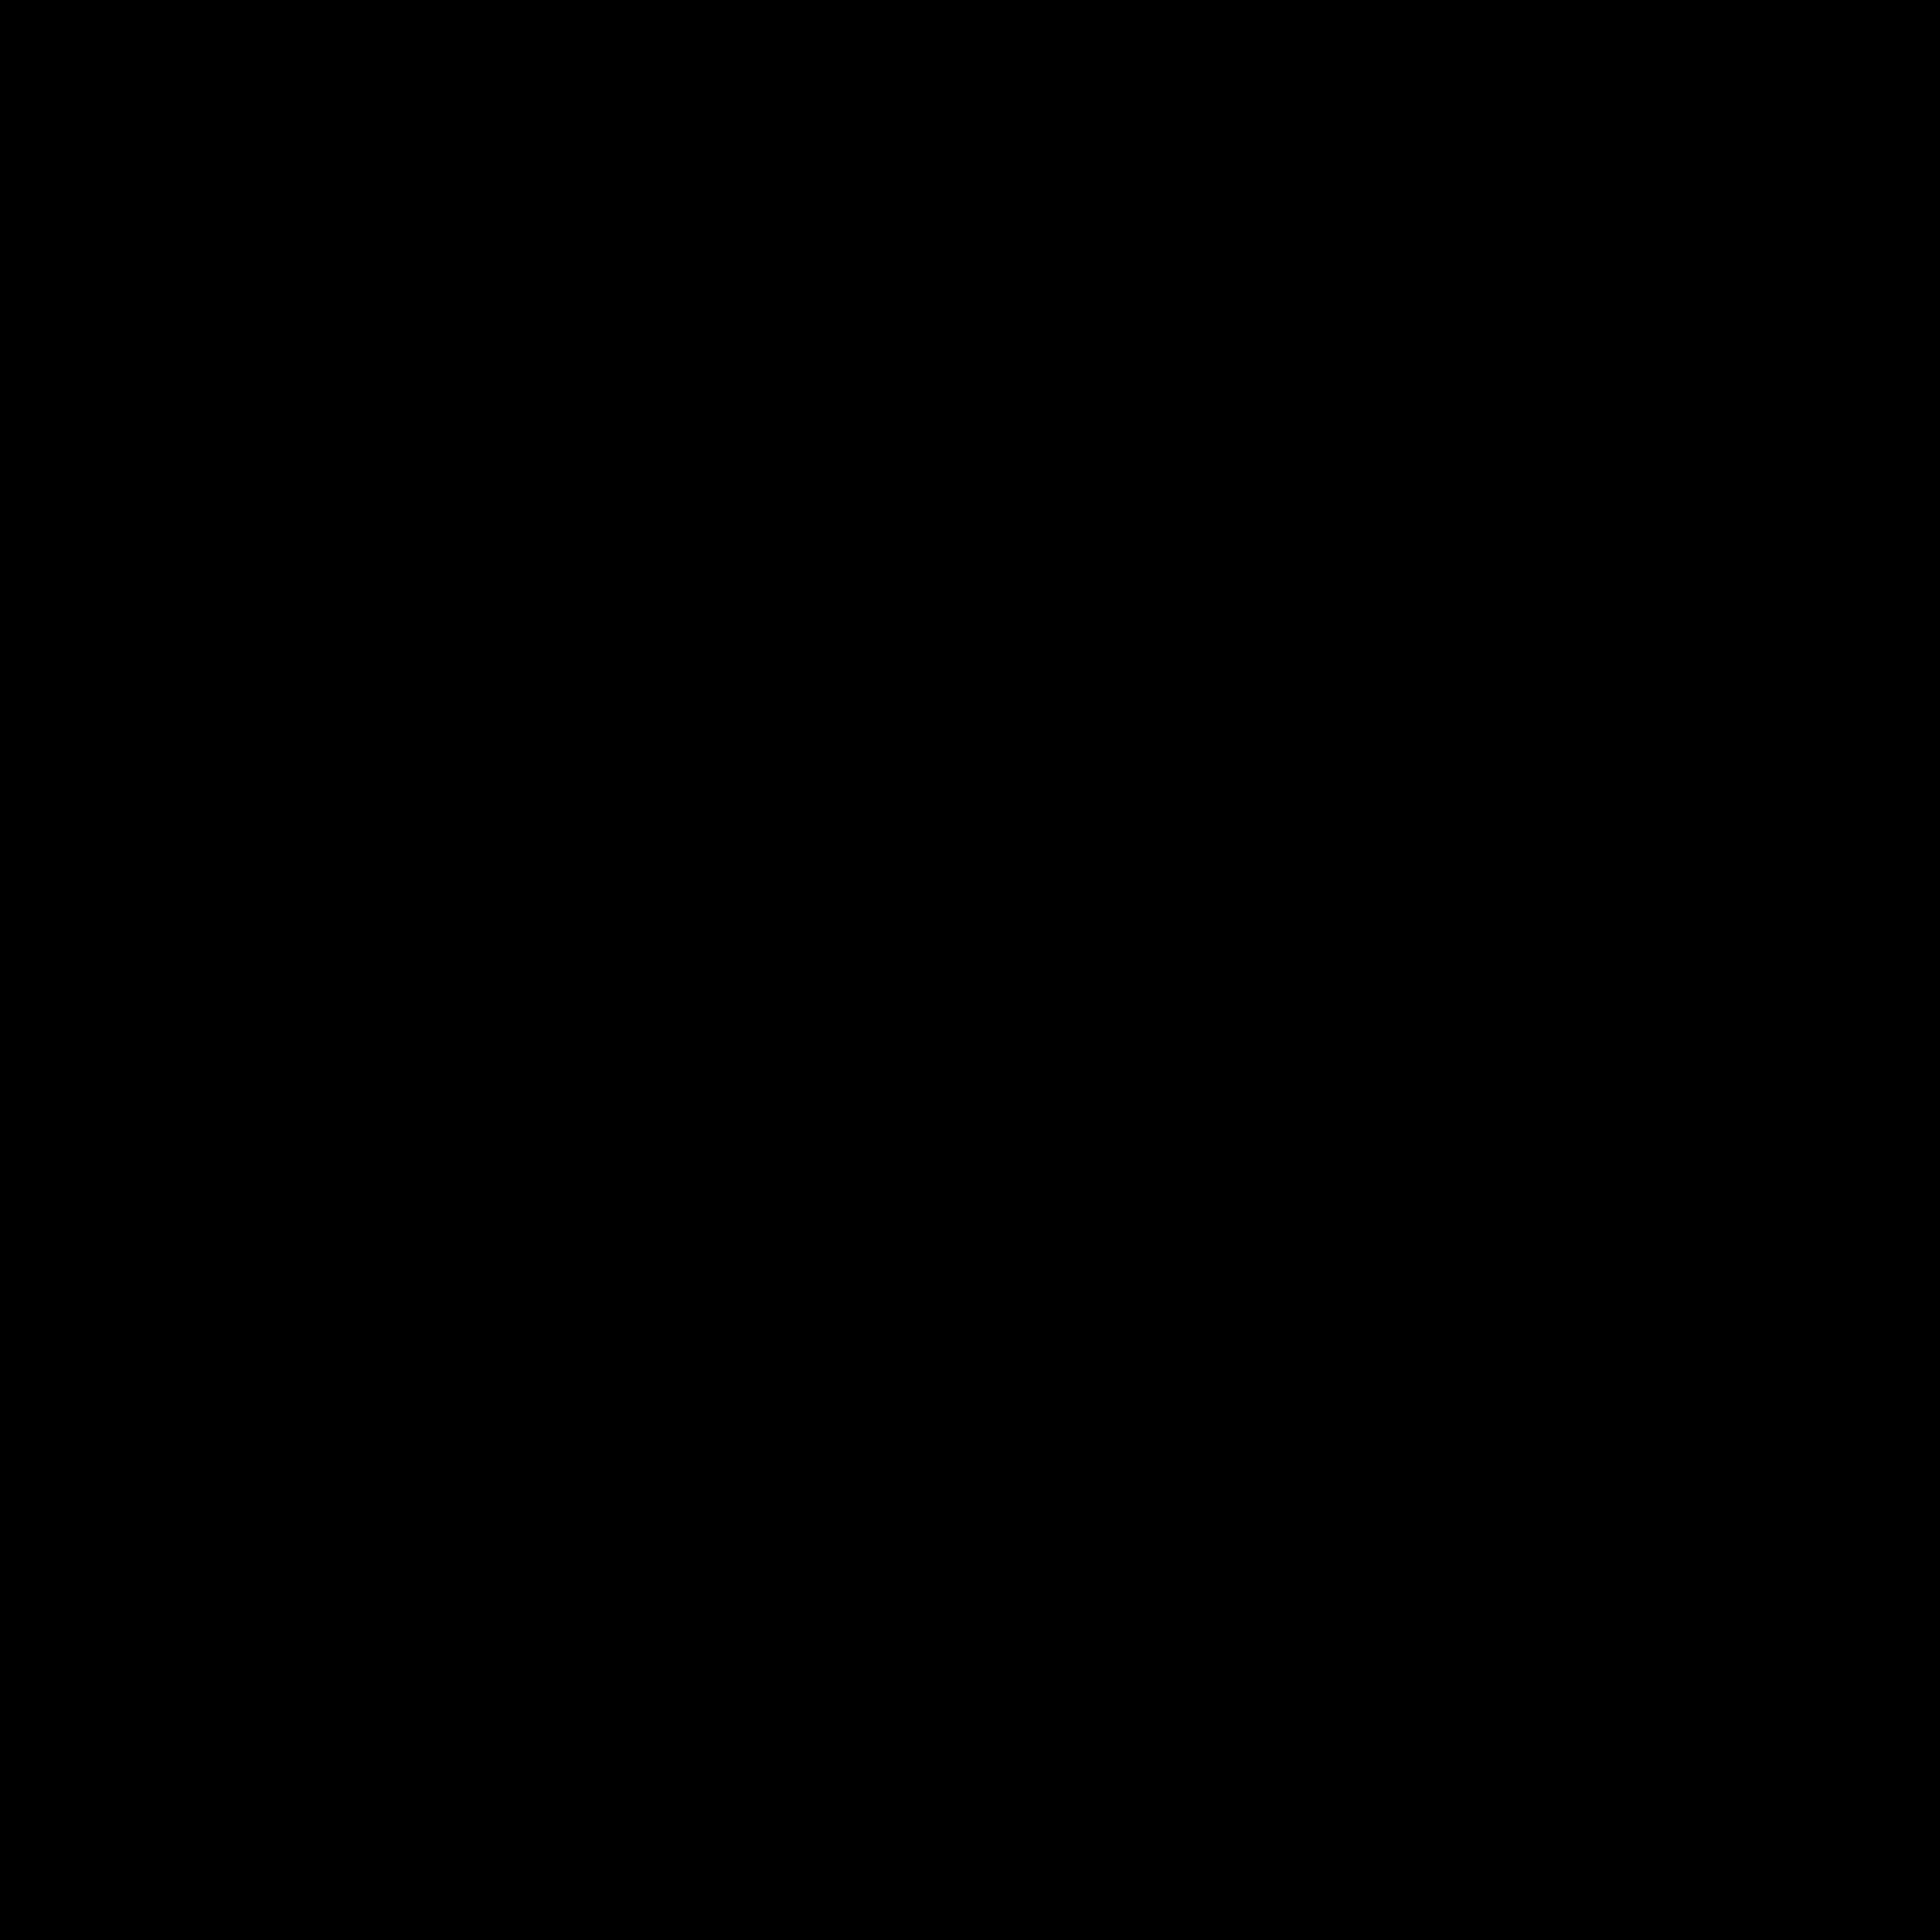 jquery icon